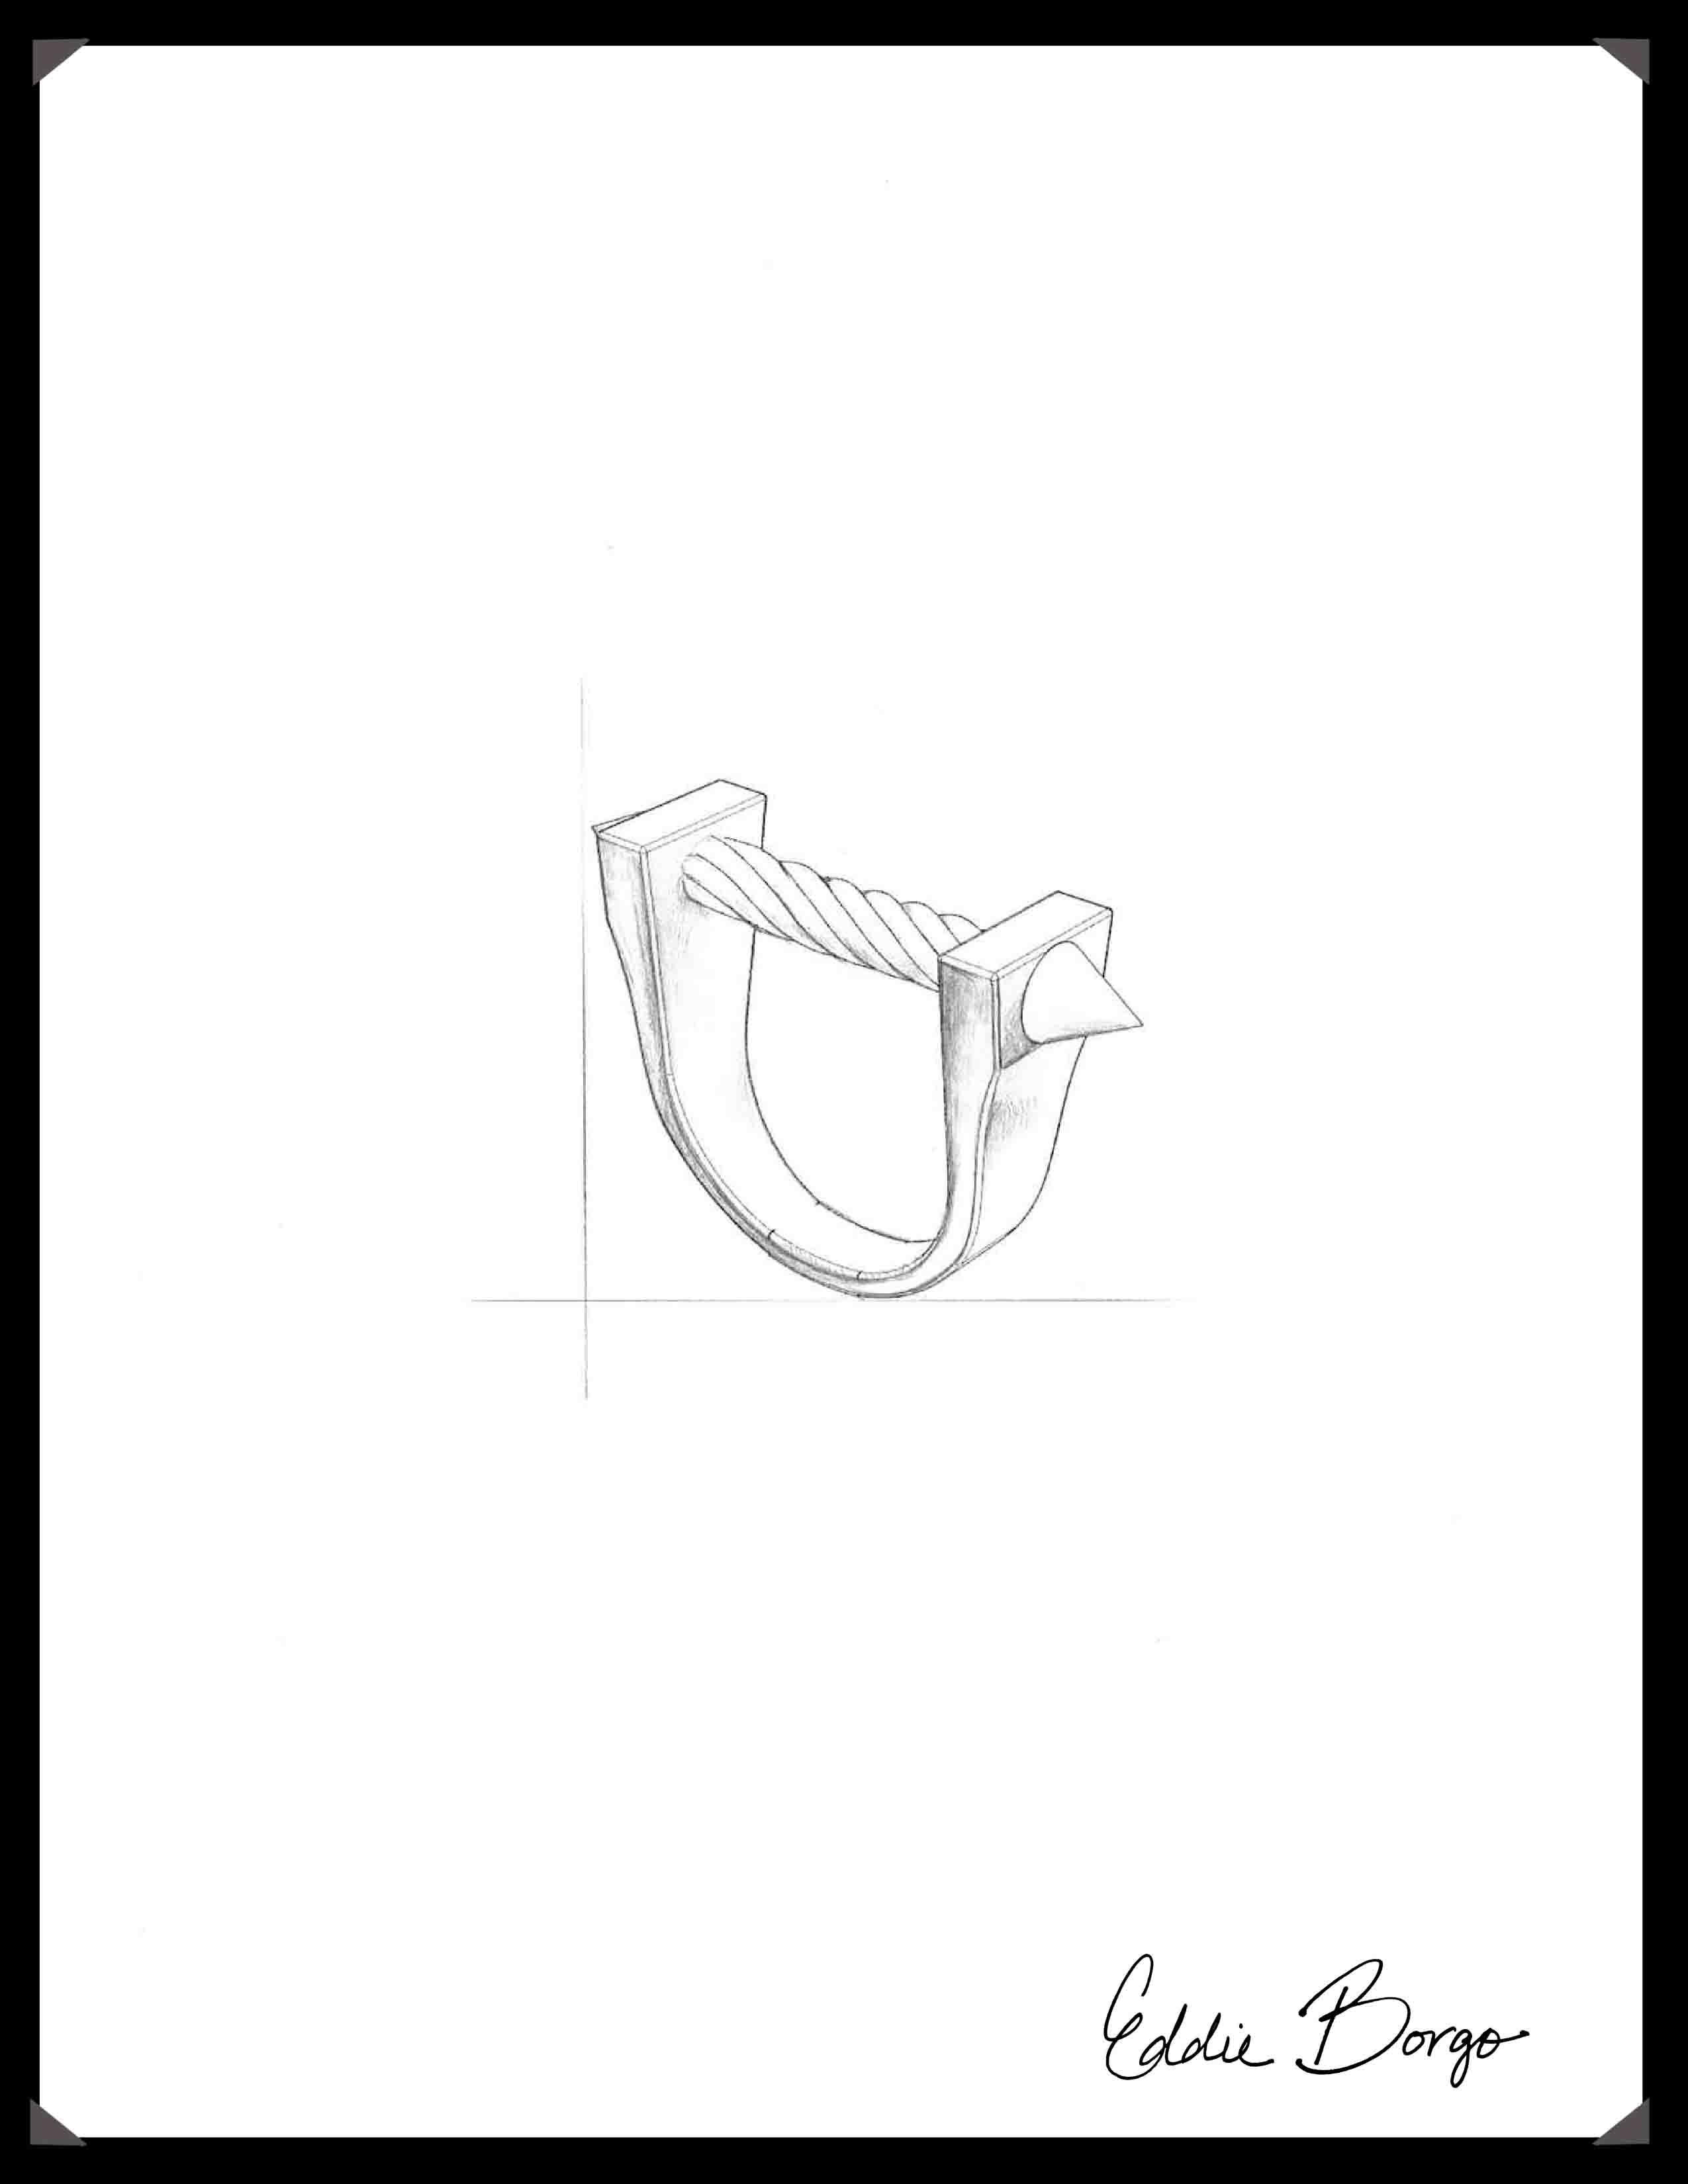 2550x3300 Eddieborgo Men Designer Sketch Equestrian Bit Ring